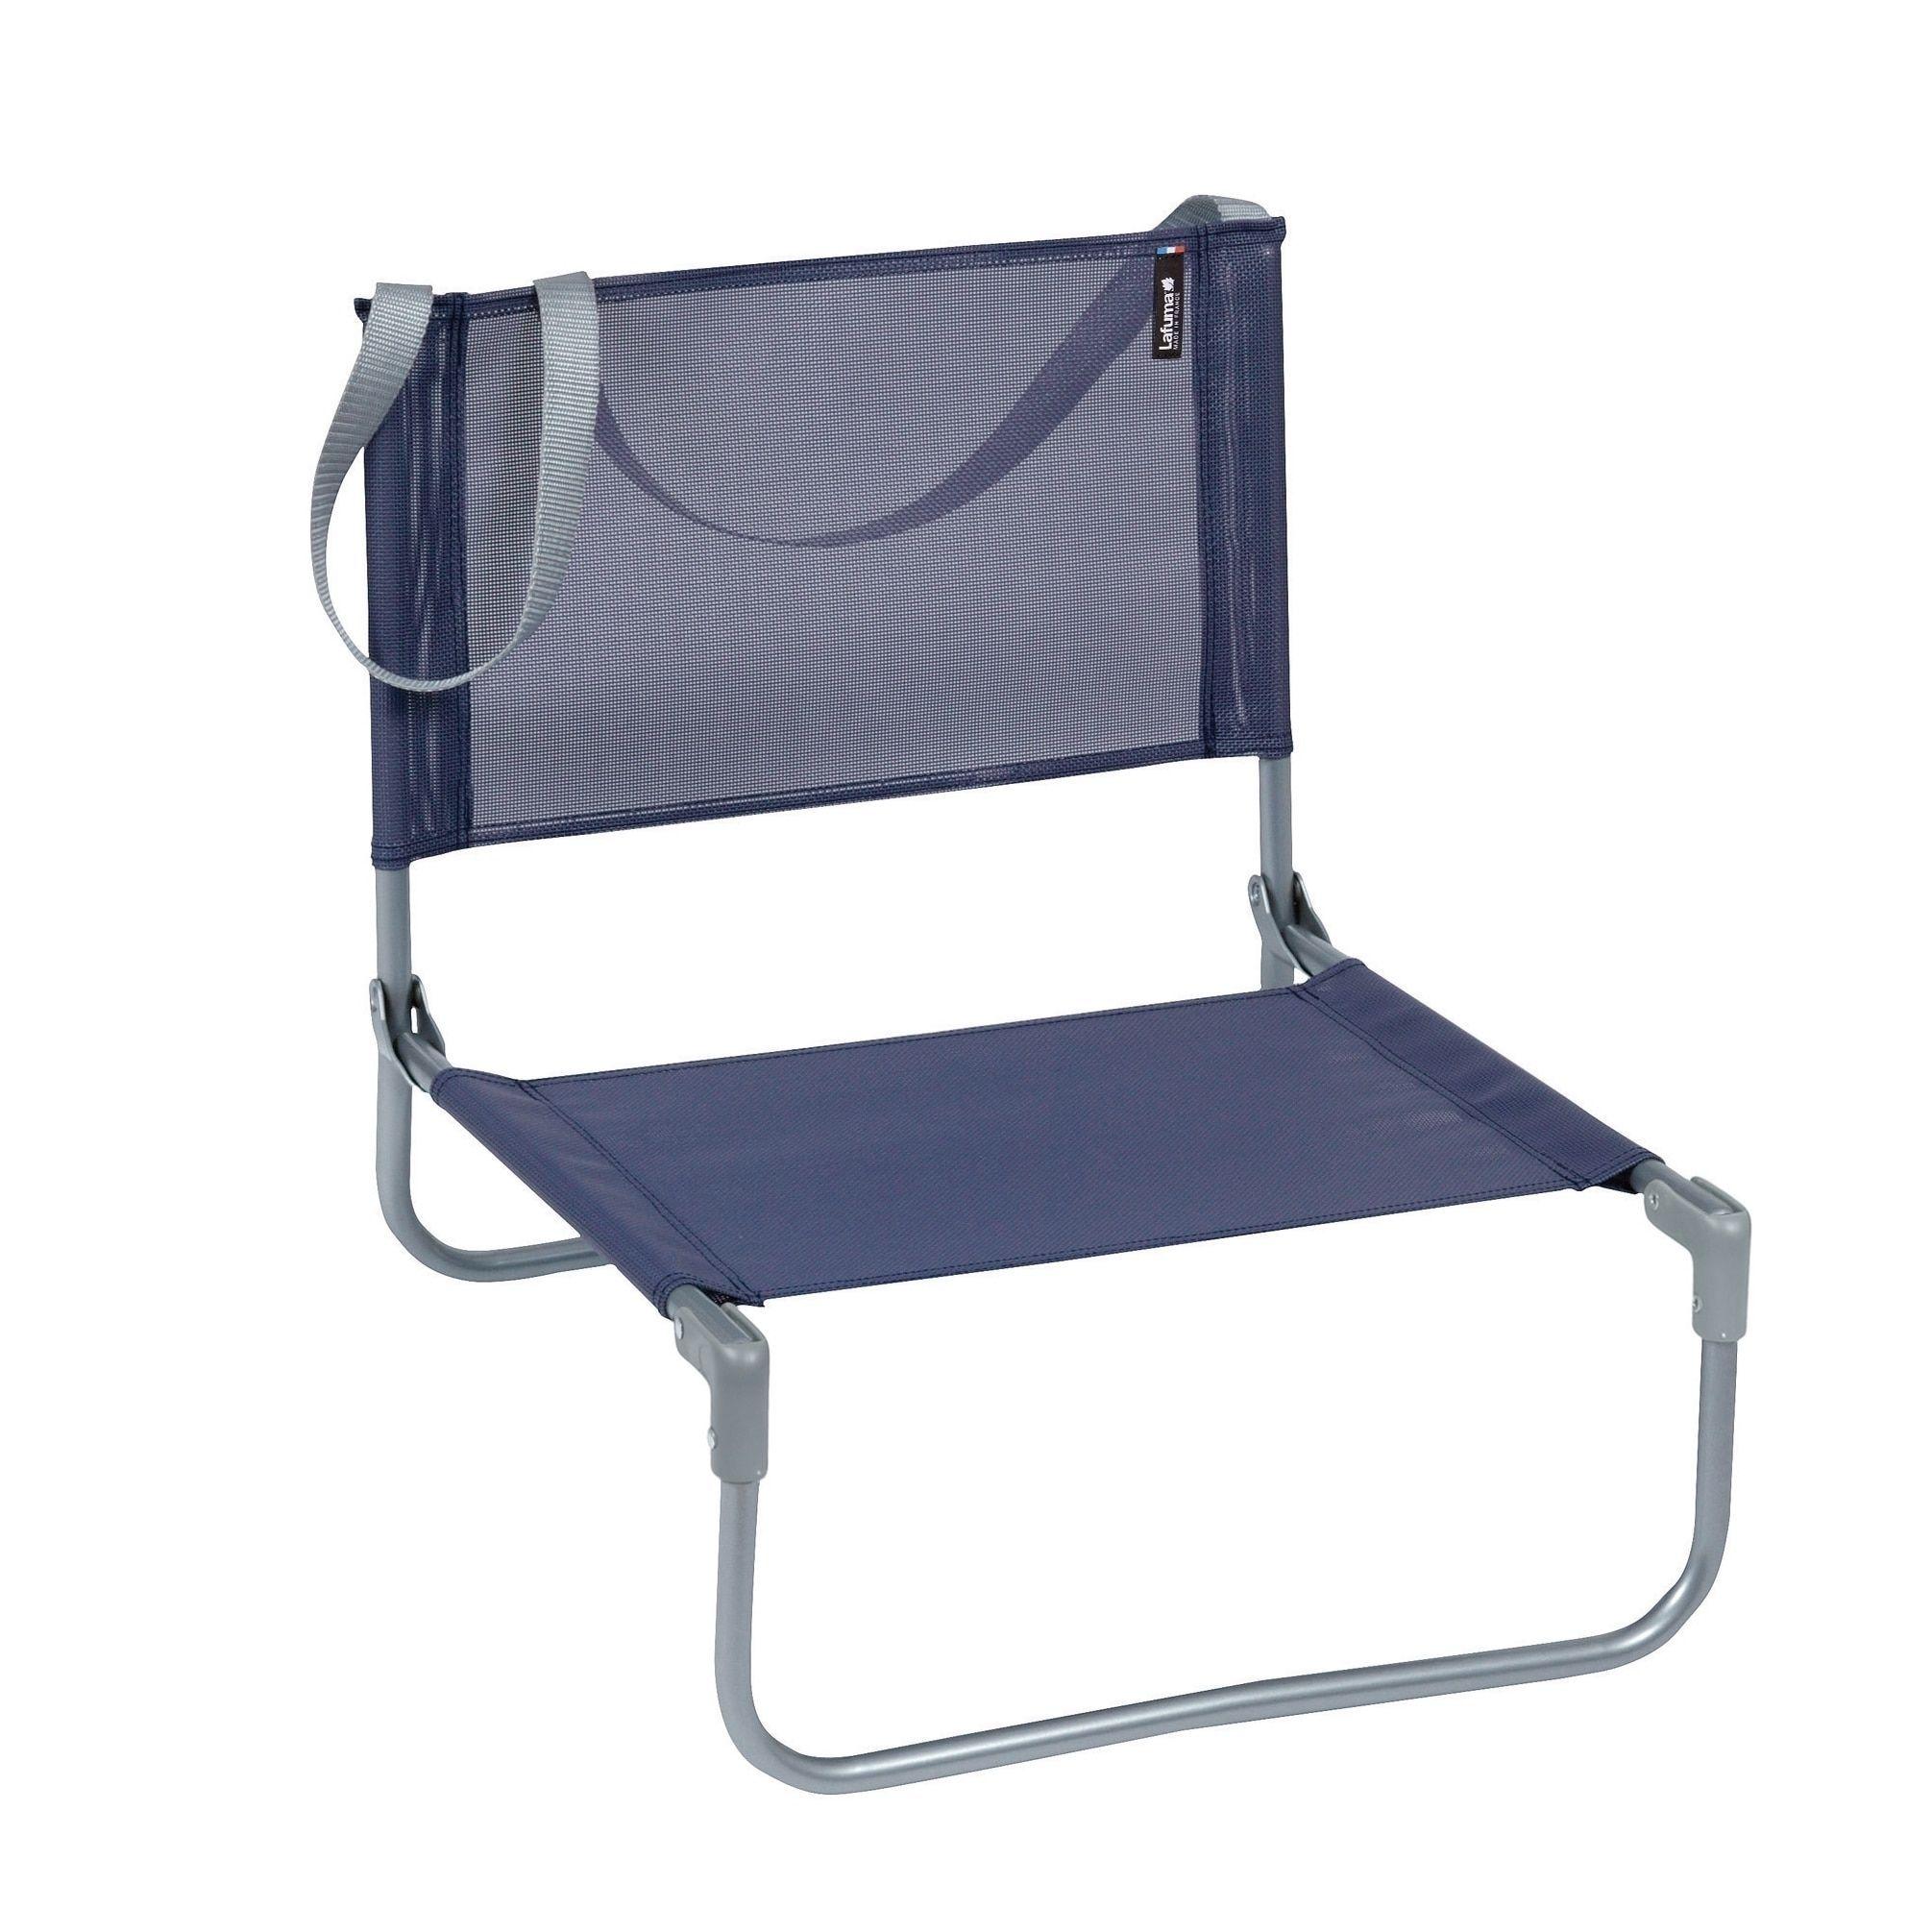 lafuma cb alu brut aluminum frame folding chair with ocean batyline rh pinterest com